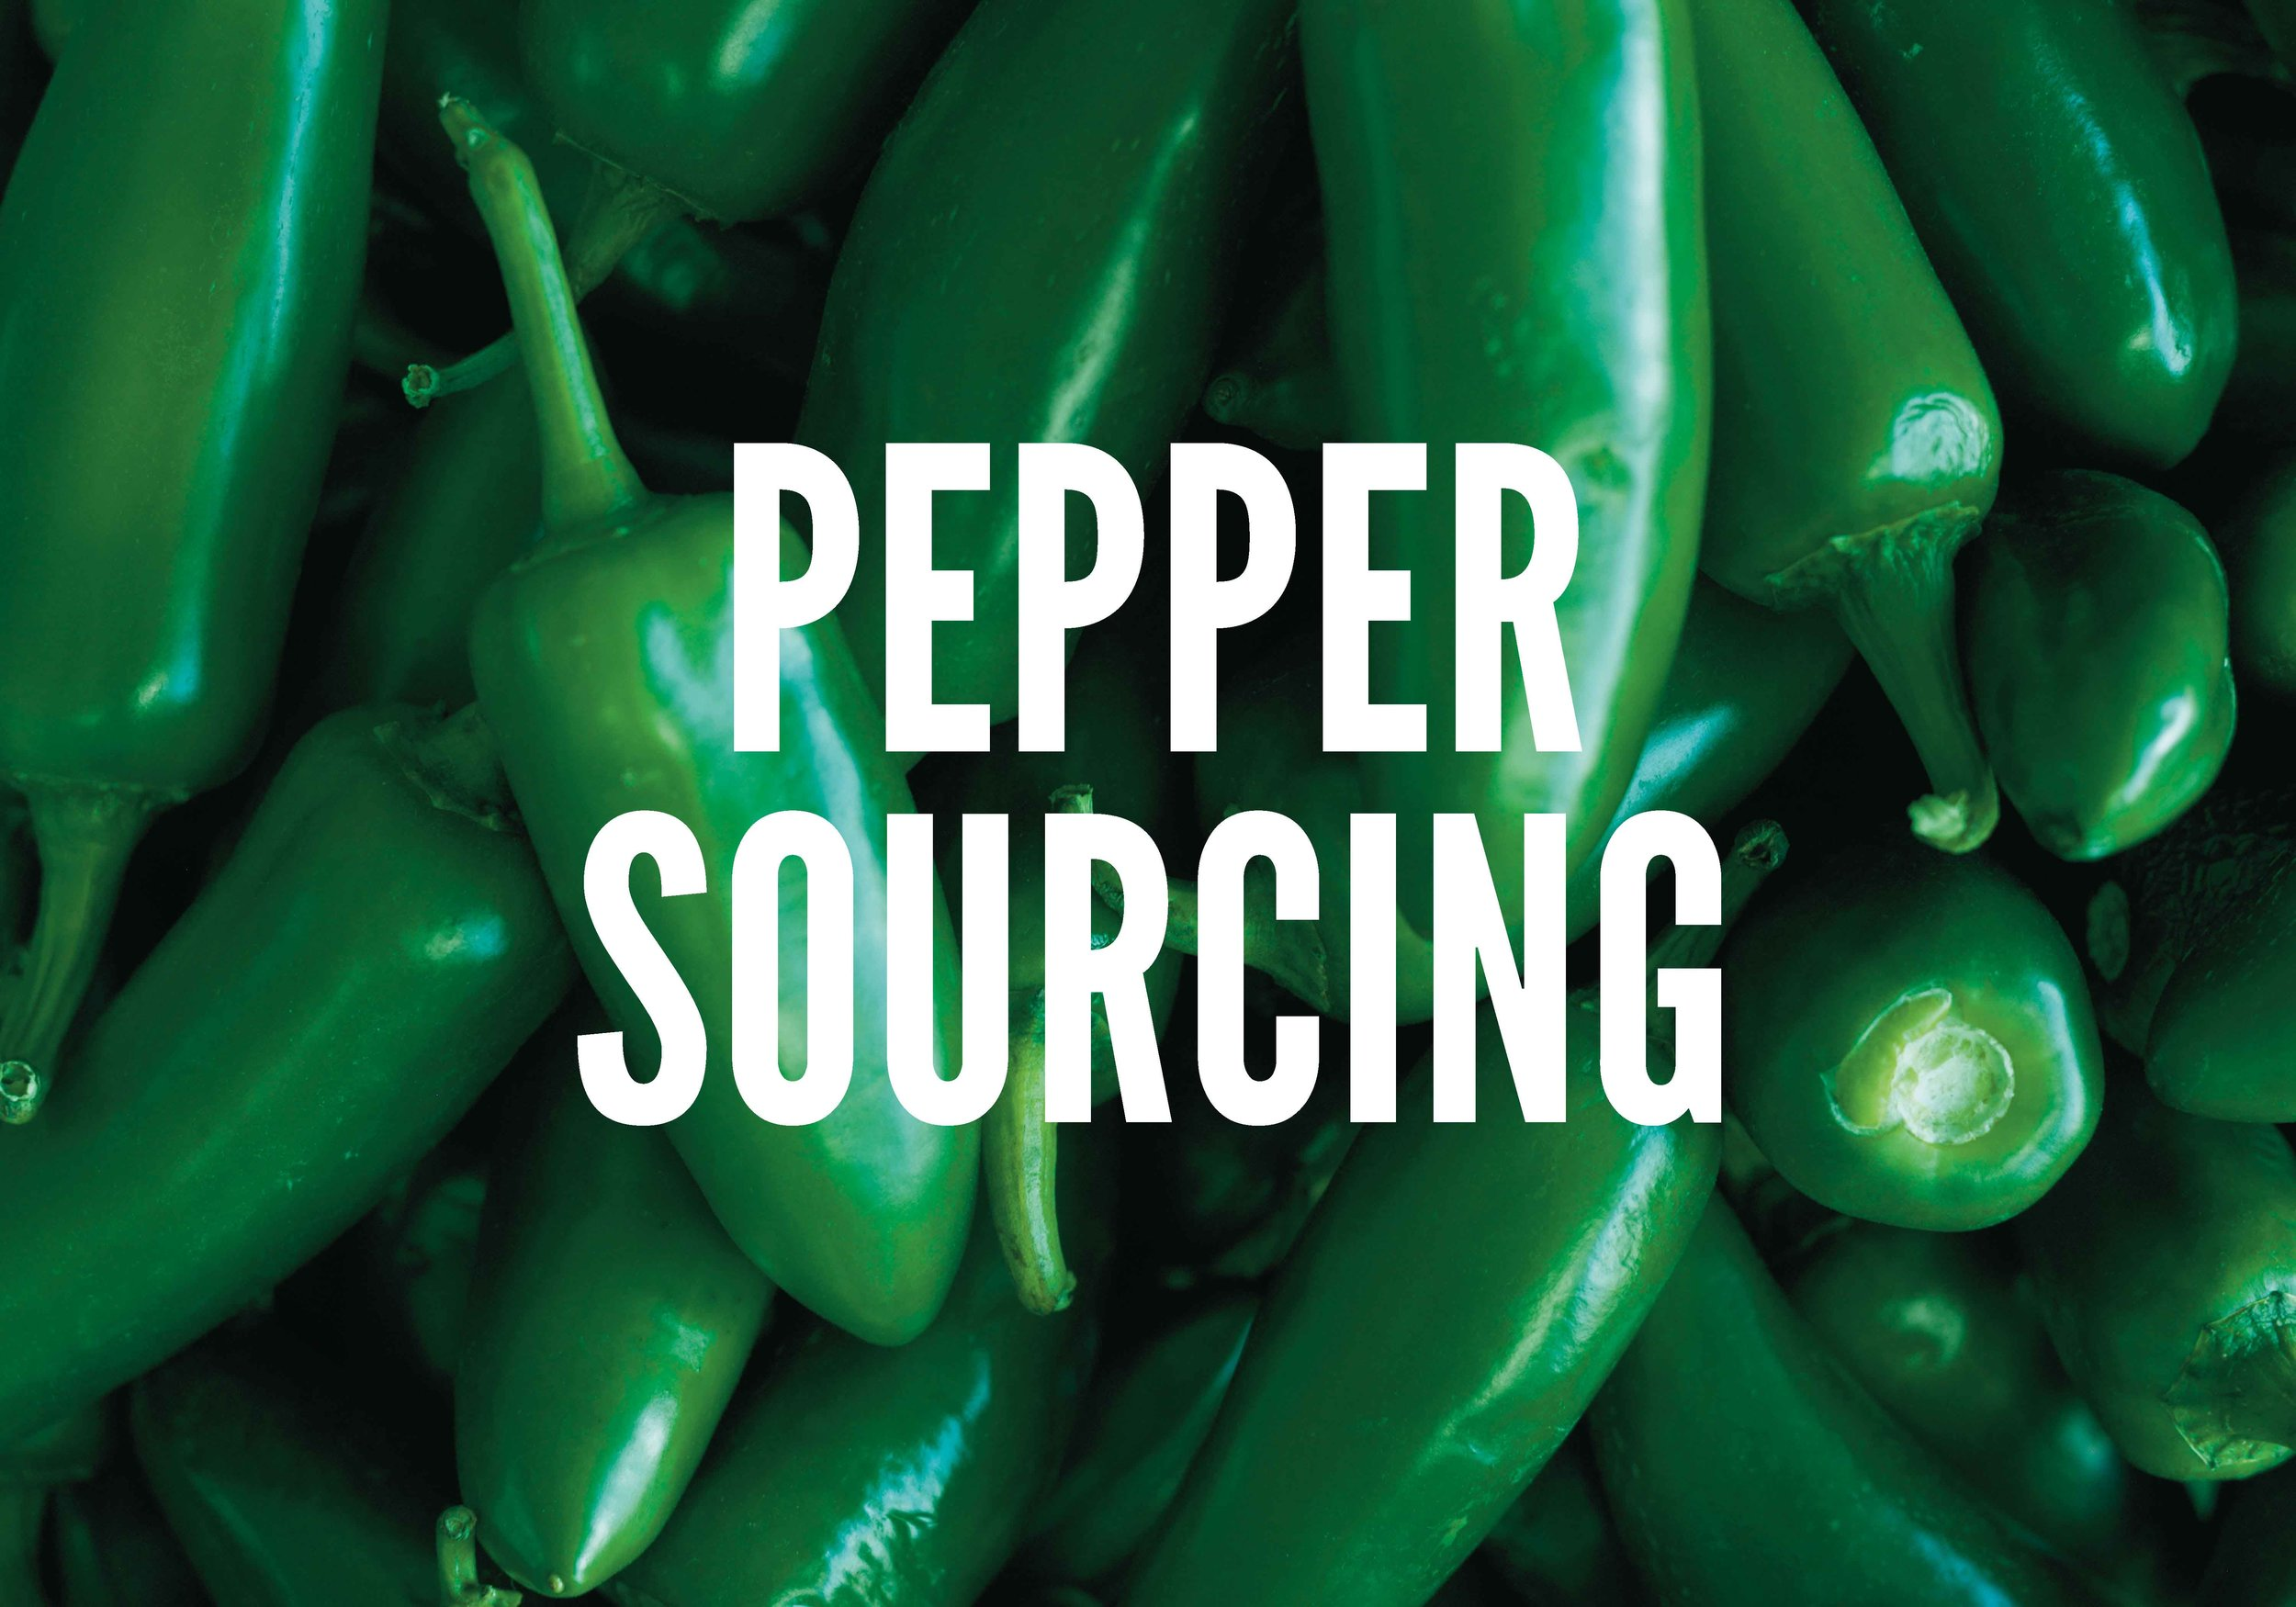 COVER. Pepper Sourcing.jpg